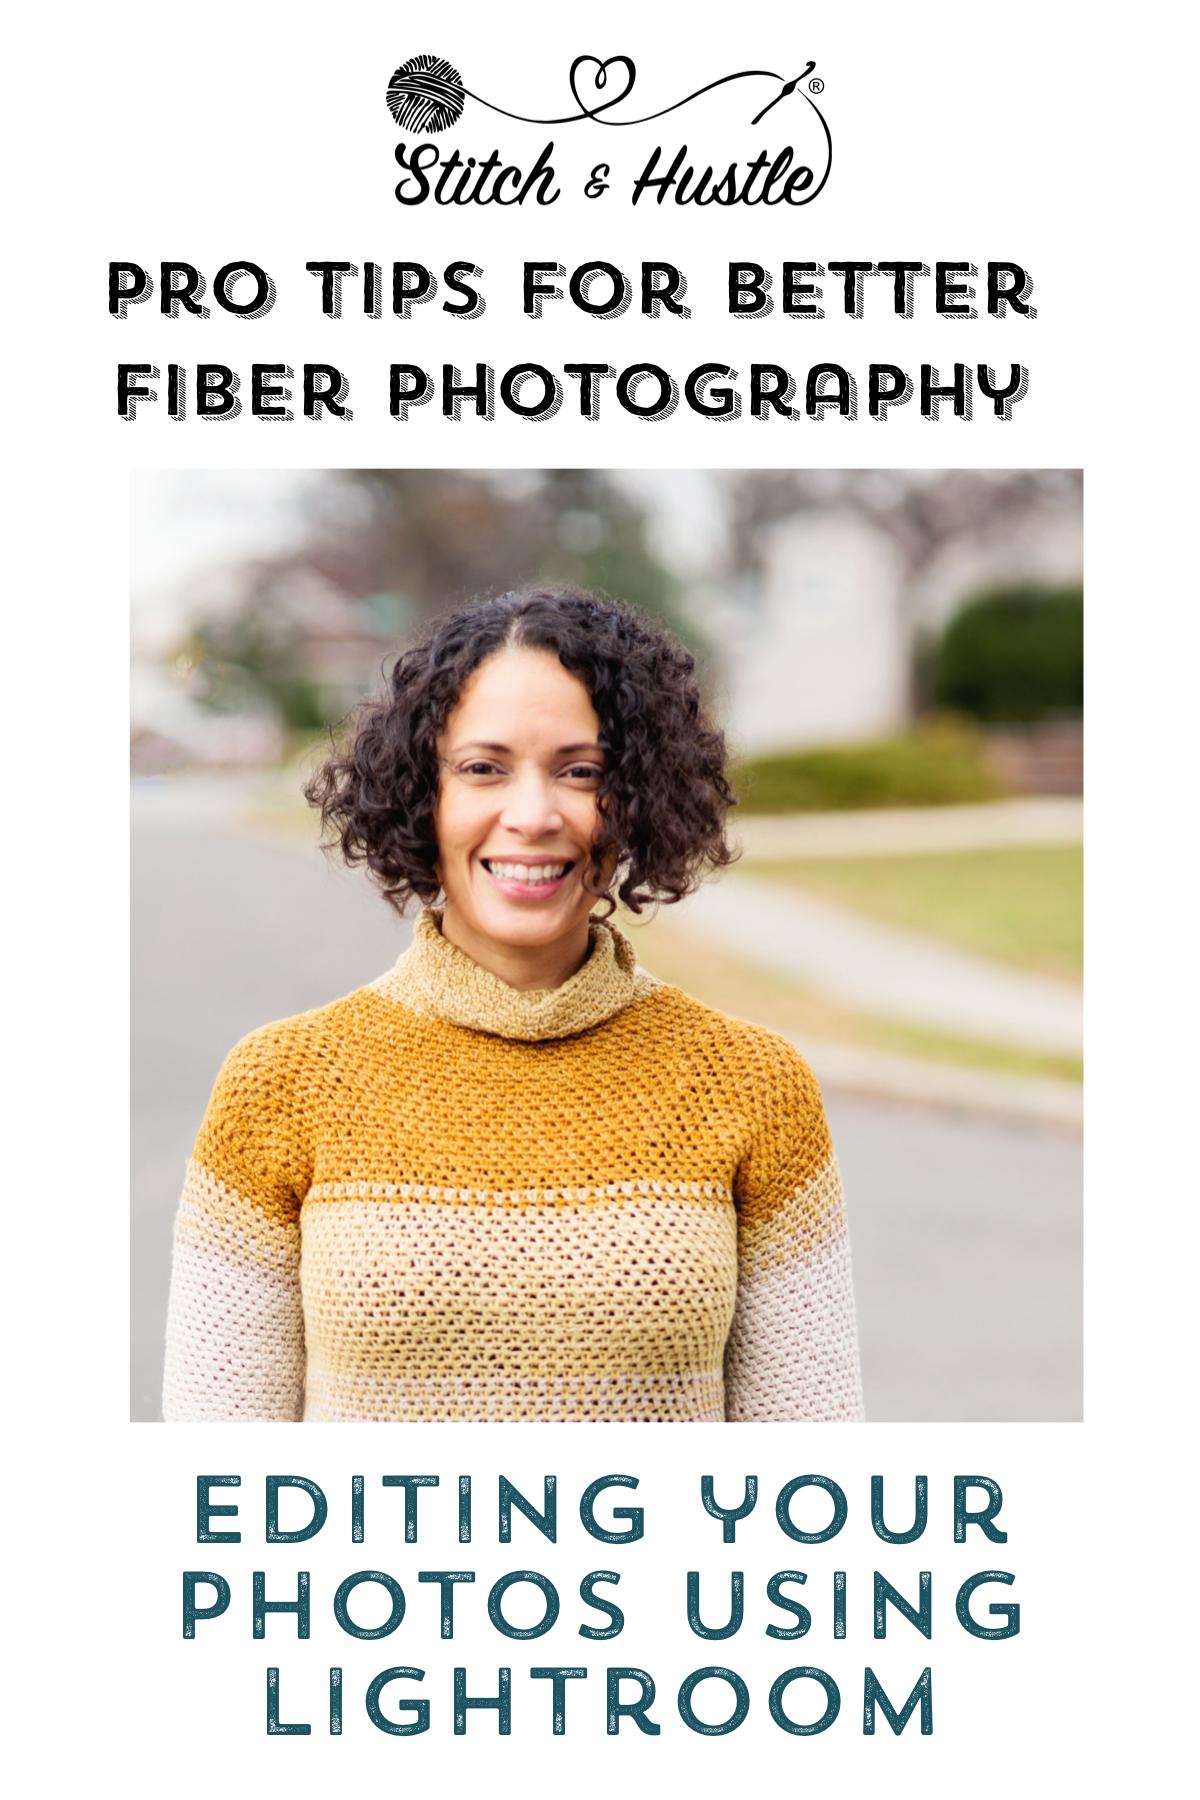 editing-photos-in-lightroom-3.jpeg